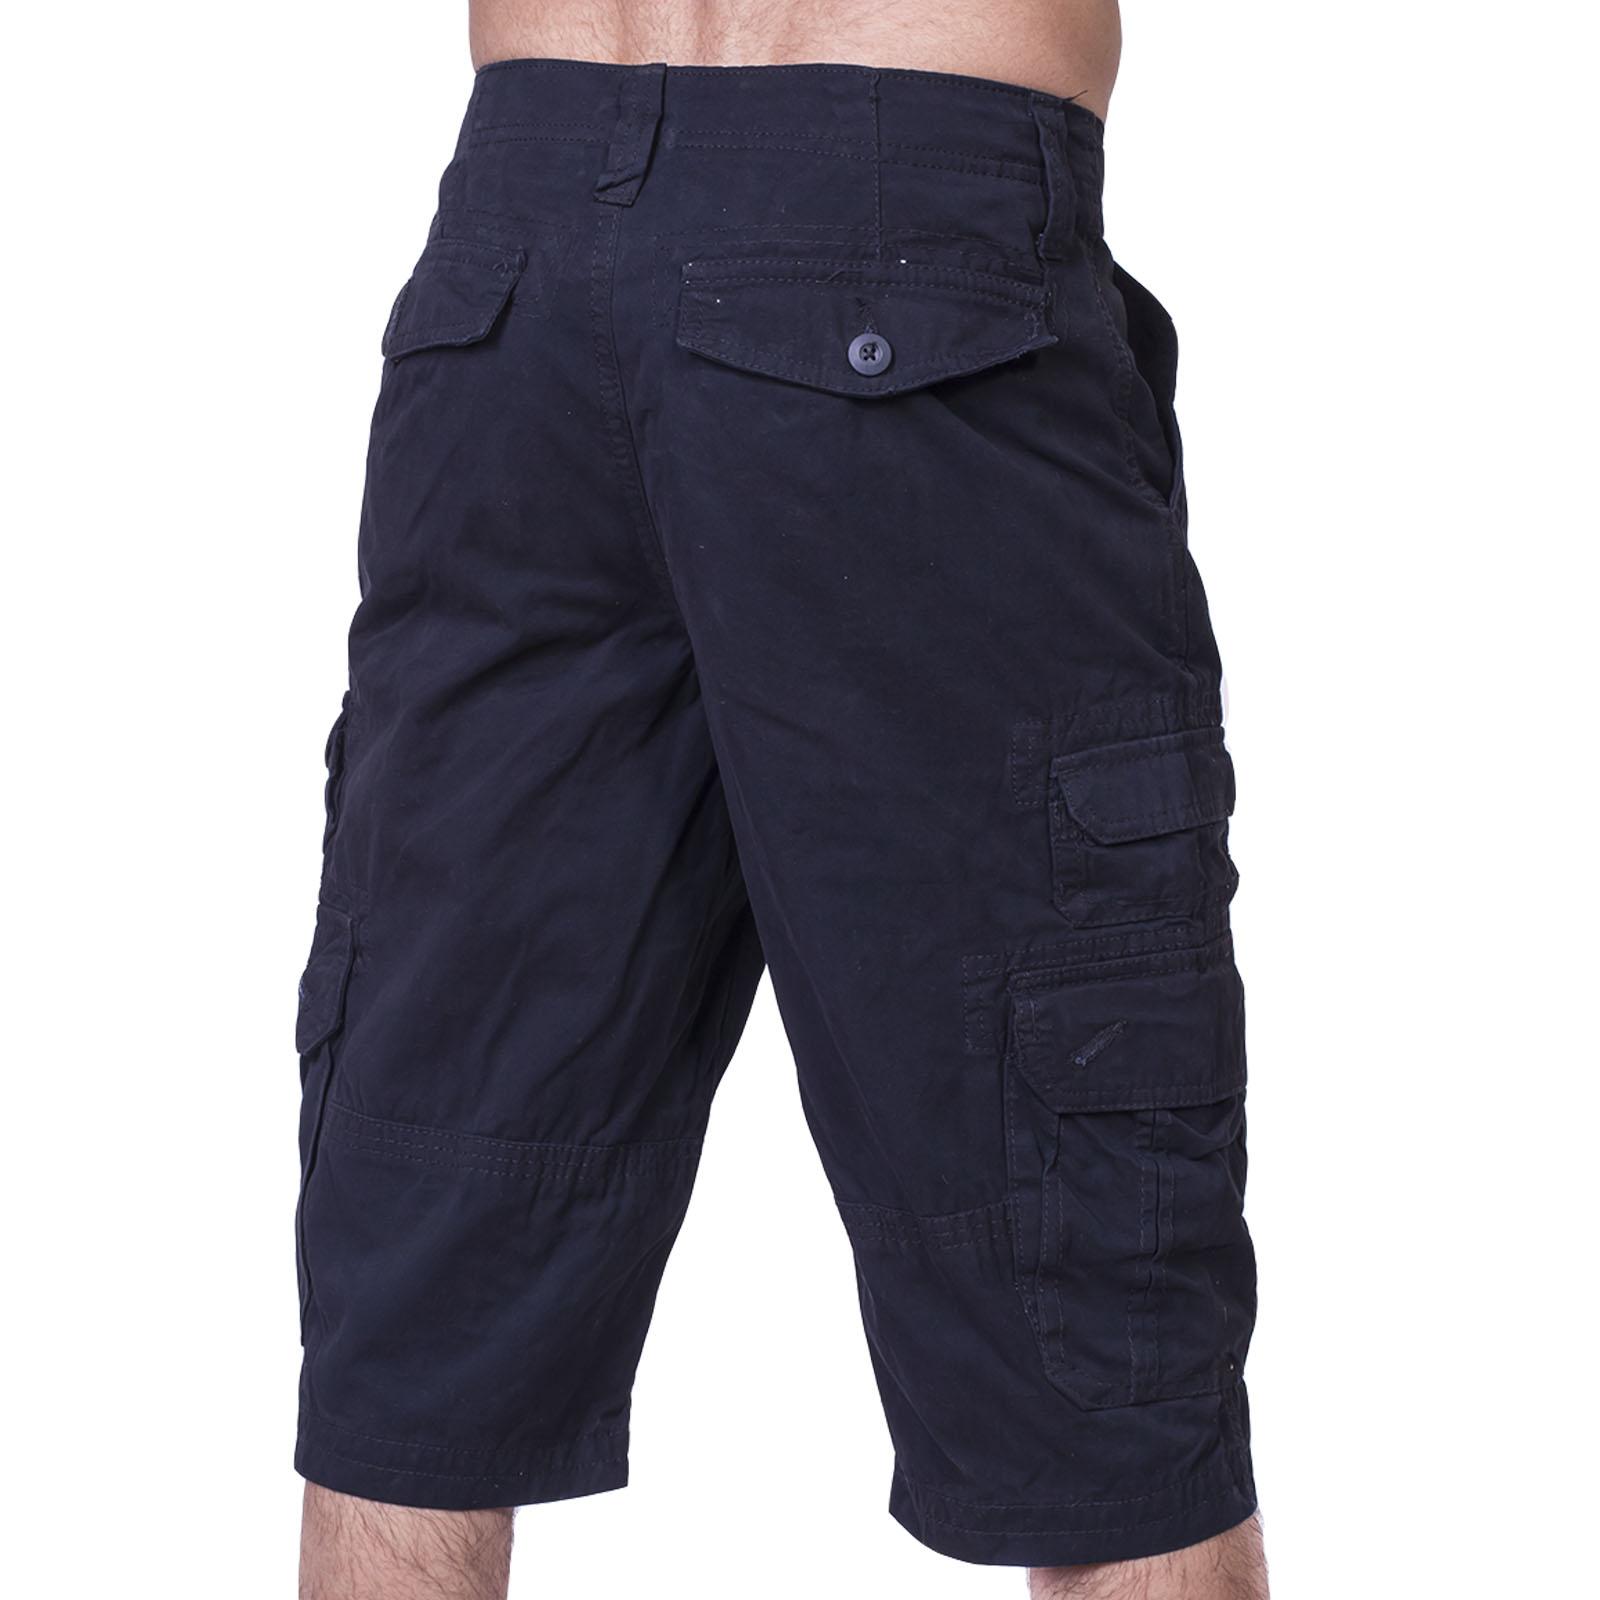 Армейские мужские шорты бриджи от ТМ Urban Pipeline